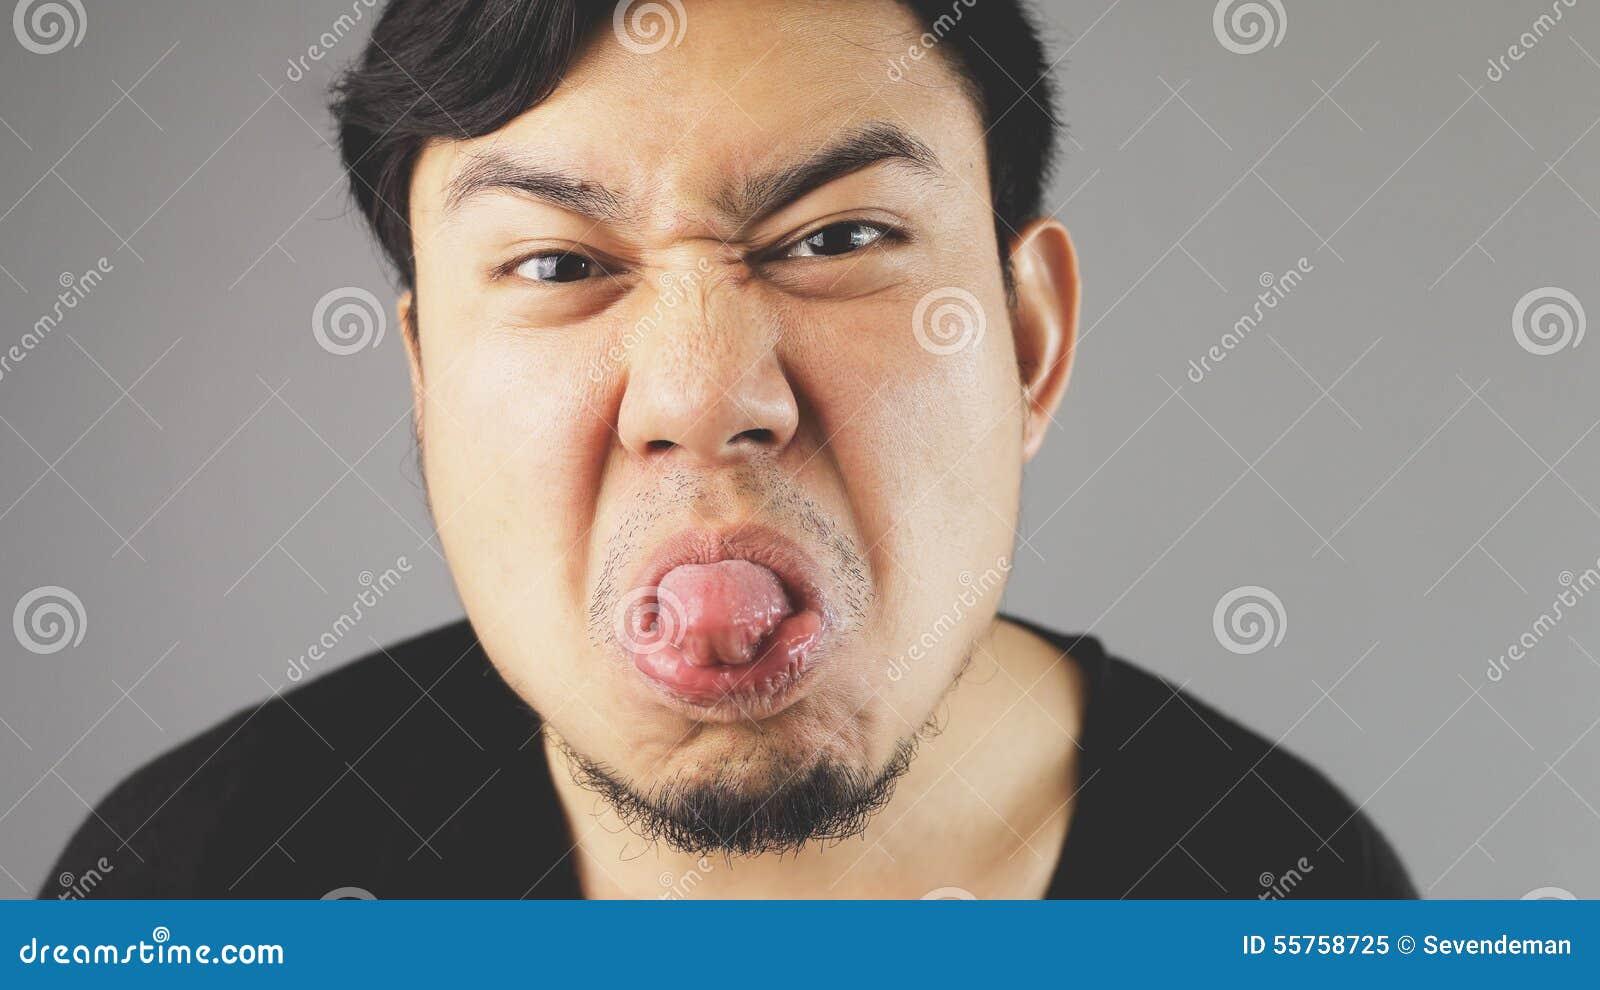 Teasing tongue.